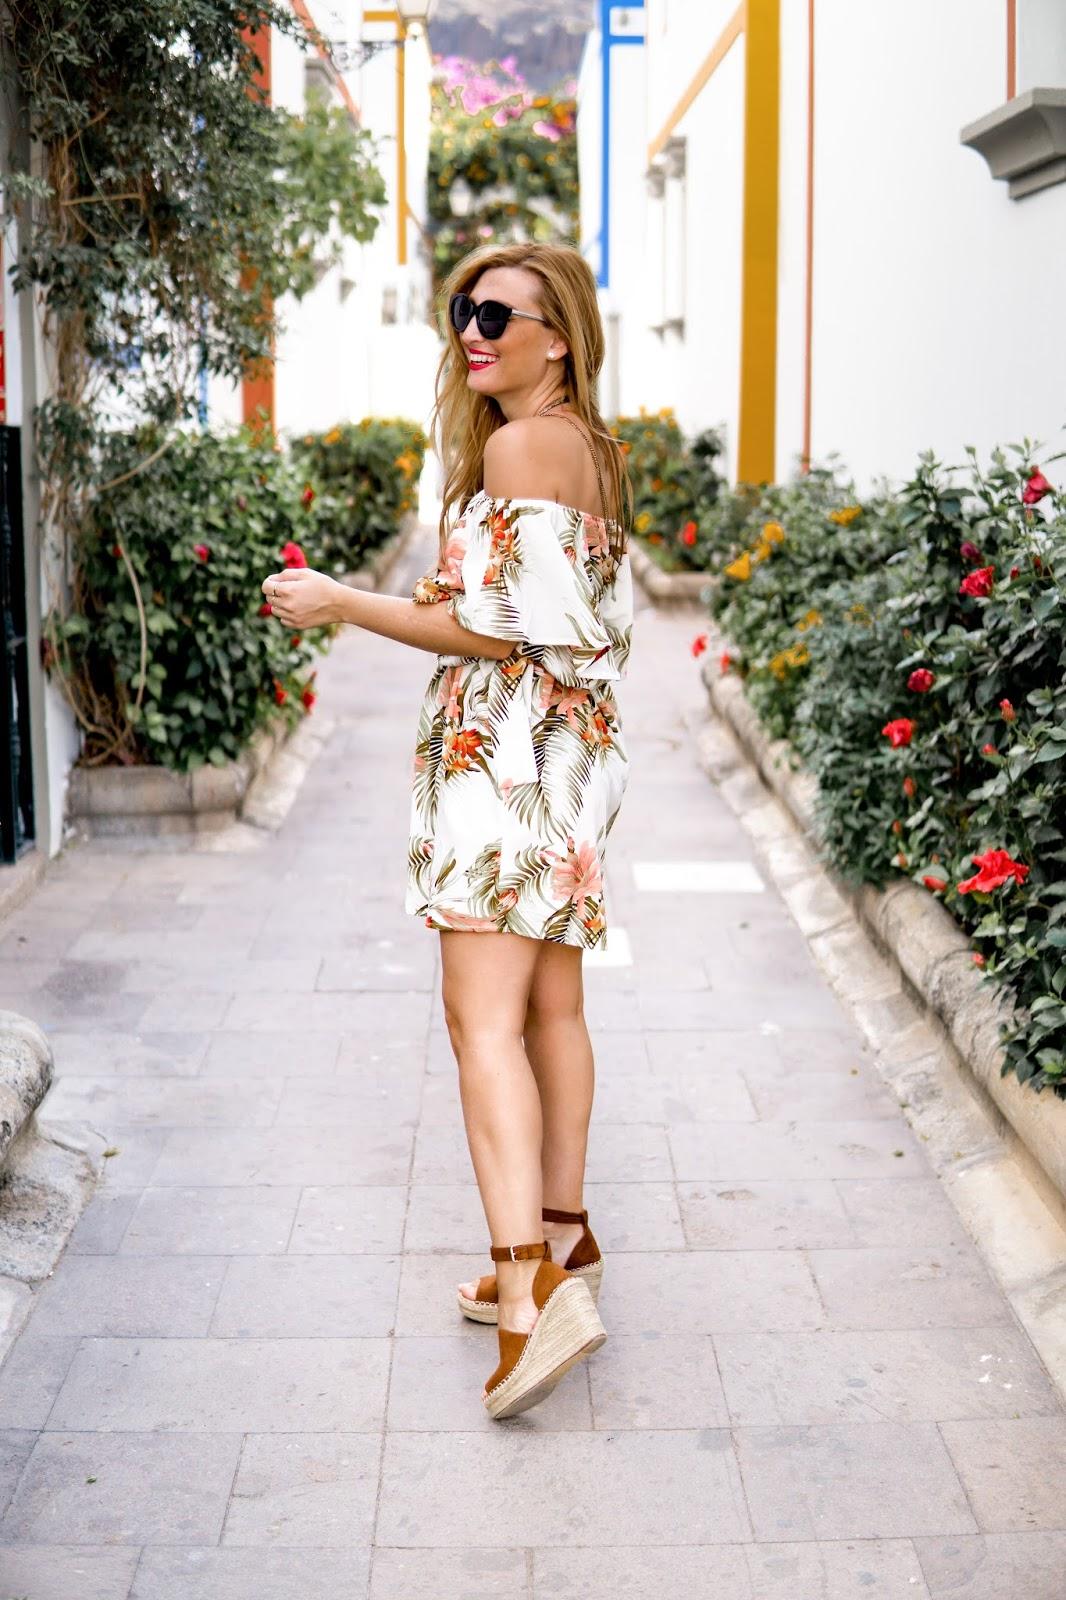 Chloe-sommer-schuhe-fashionblogger-mit-braunen-schuhen-chloe-drew-bag-looklike